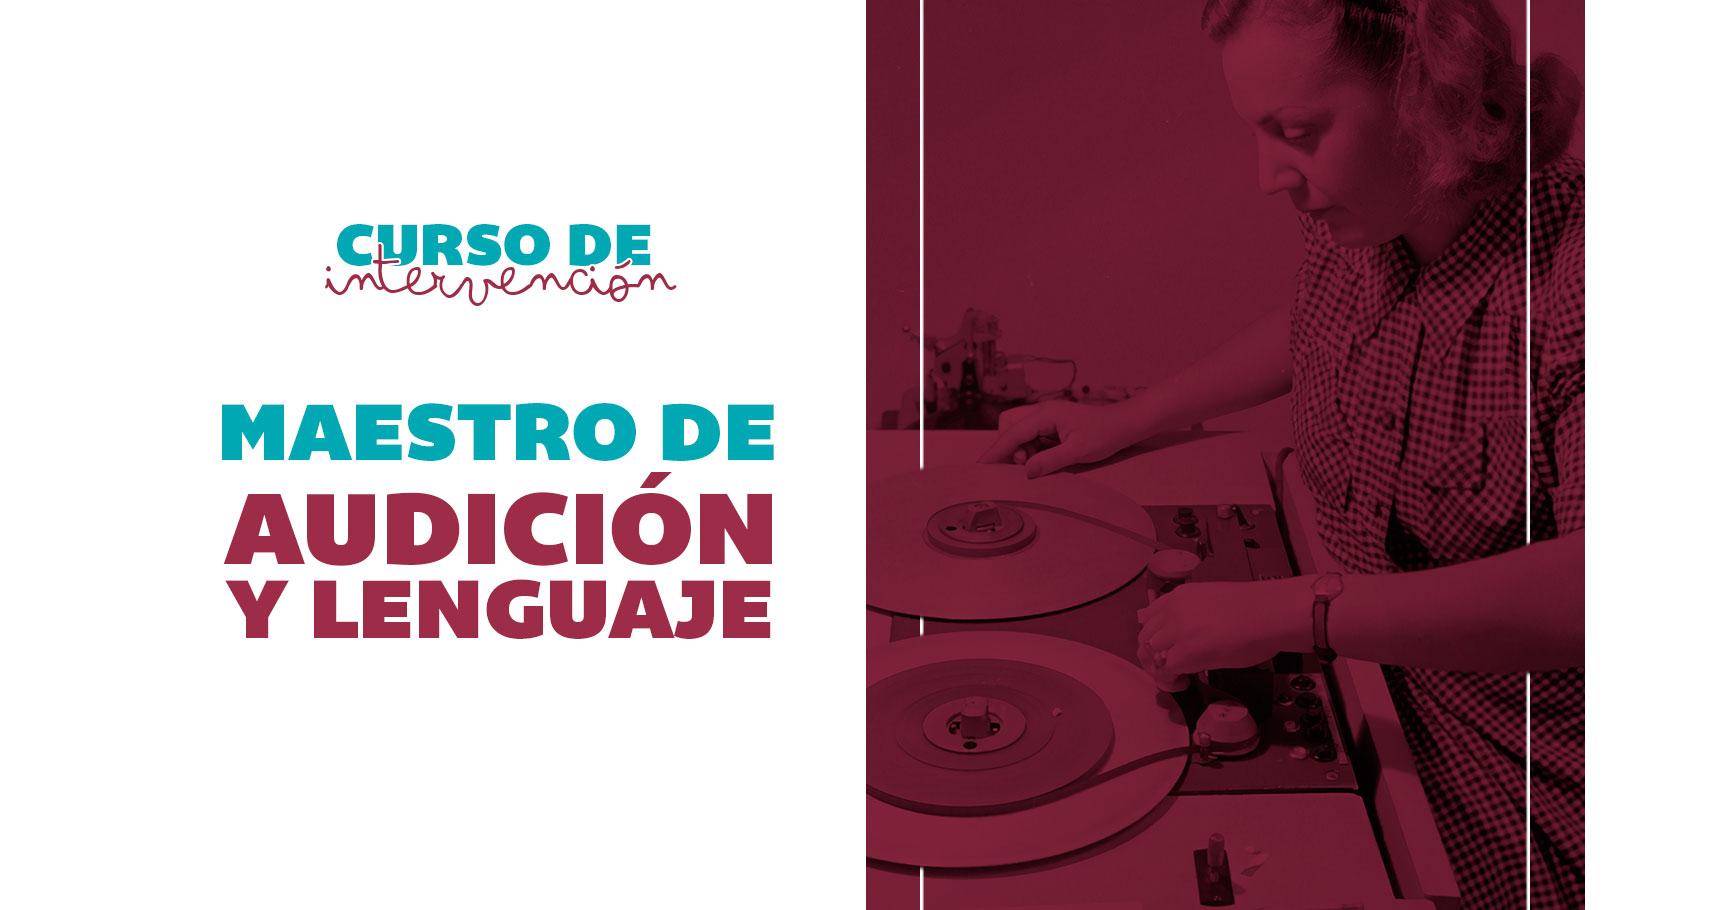 Pupitre_cursos-intervencion-audicion-y-lenguaje_portada-C